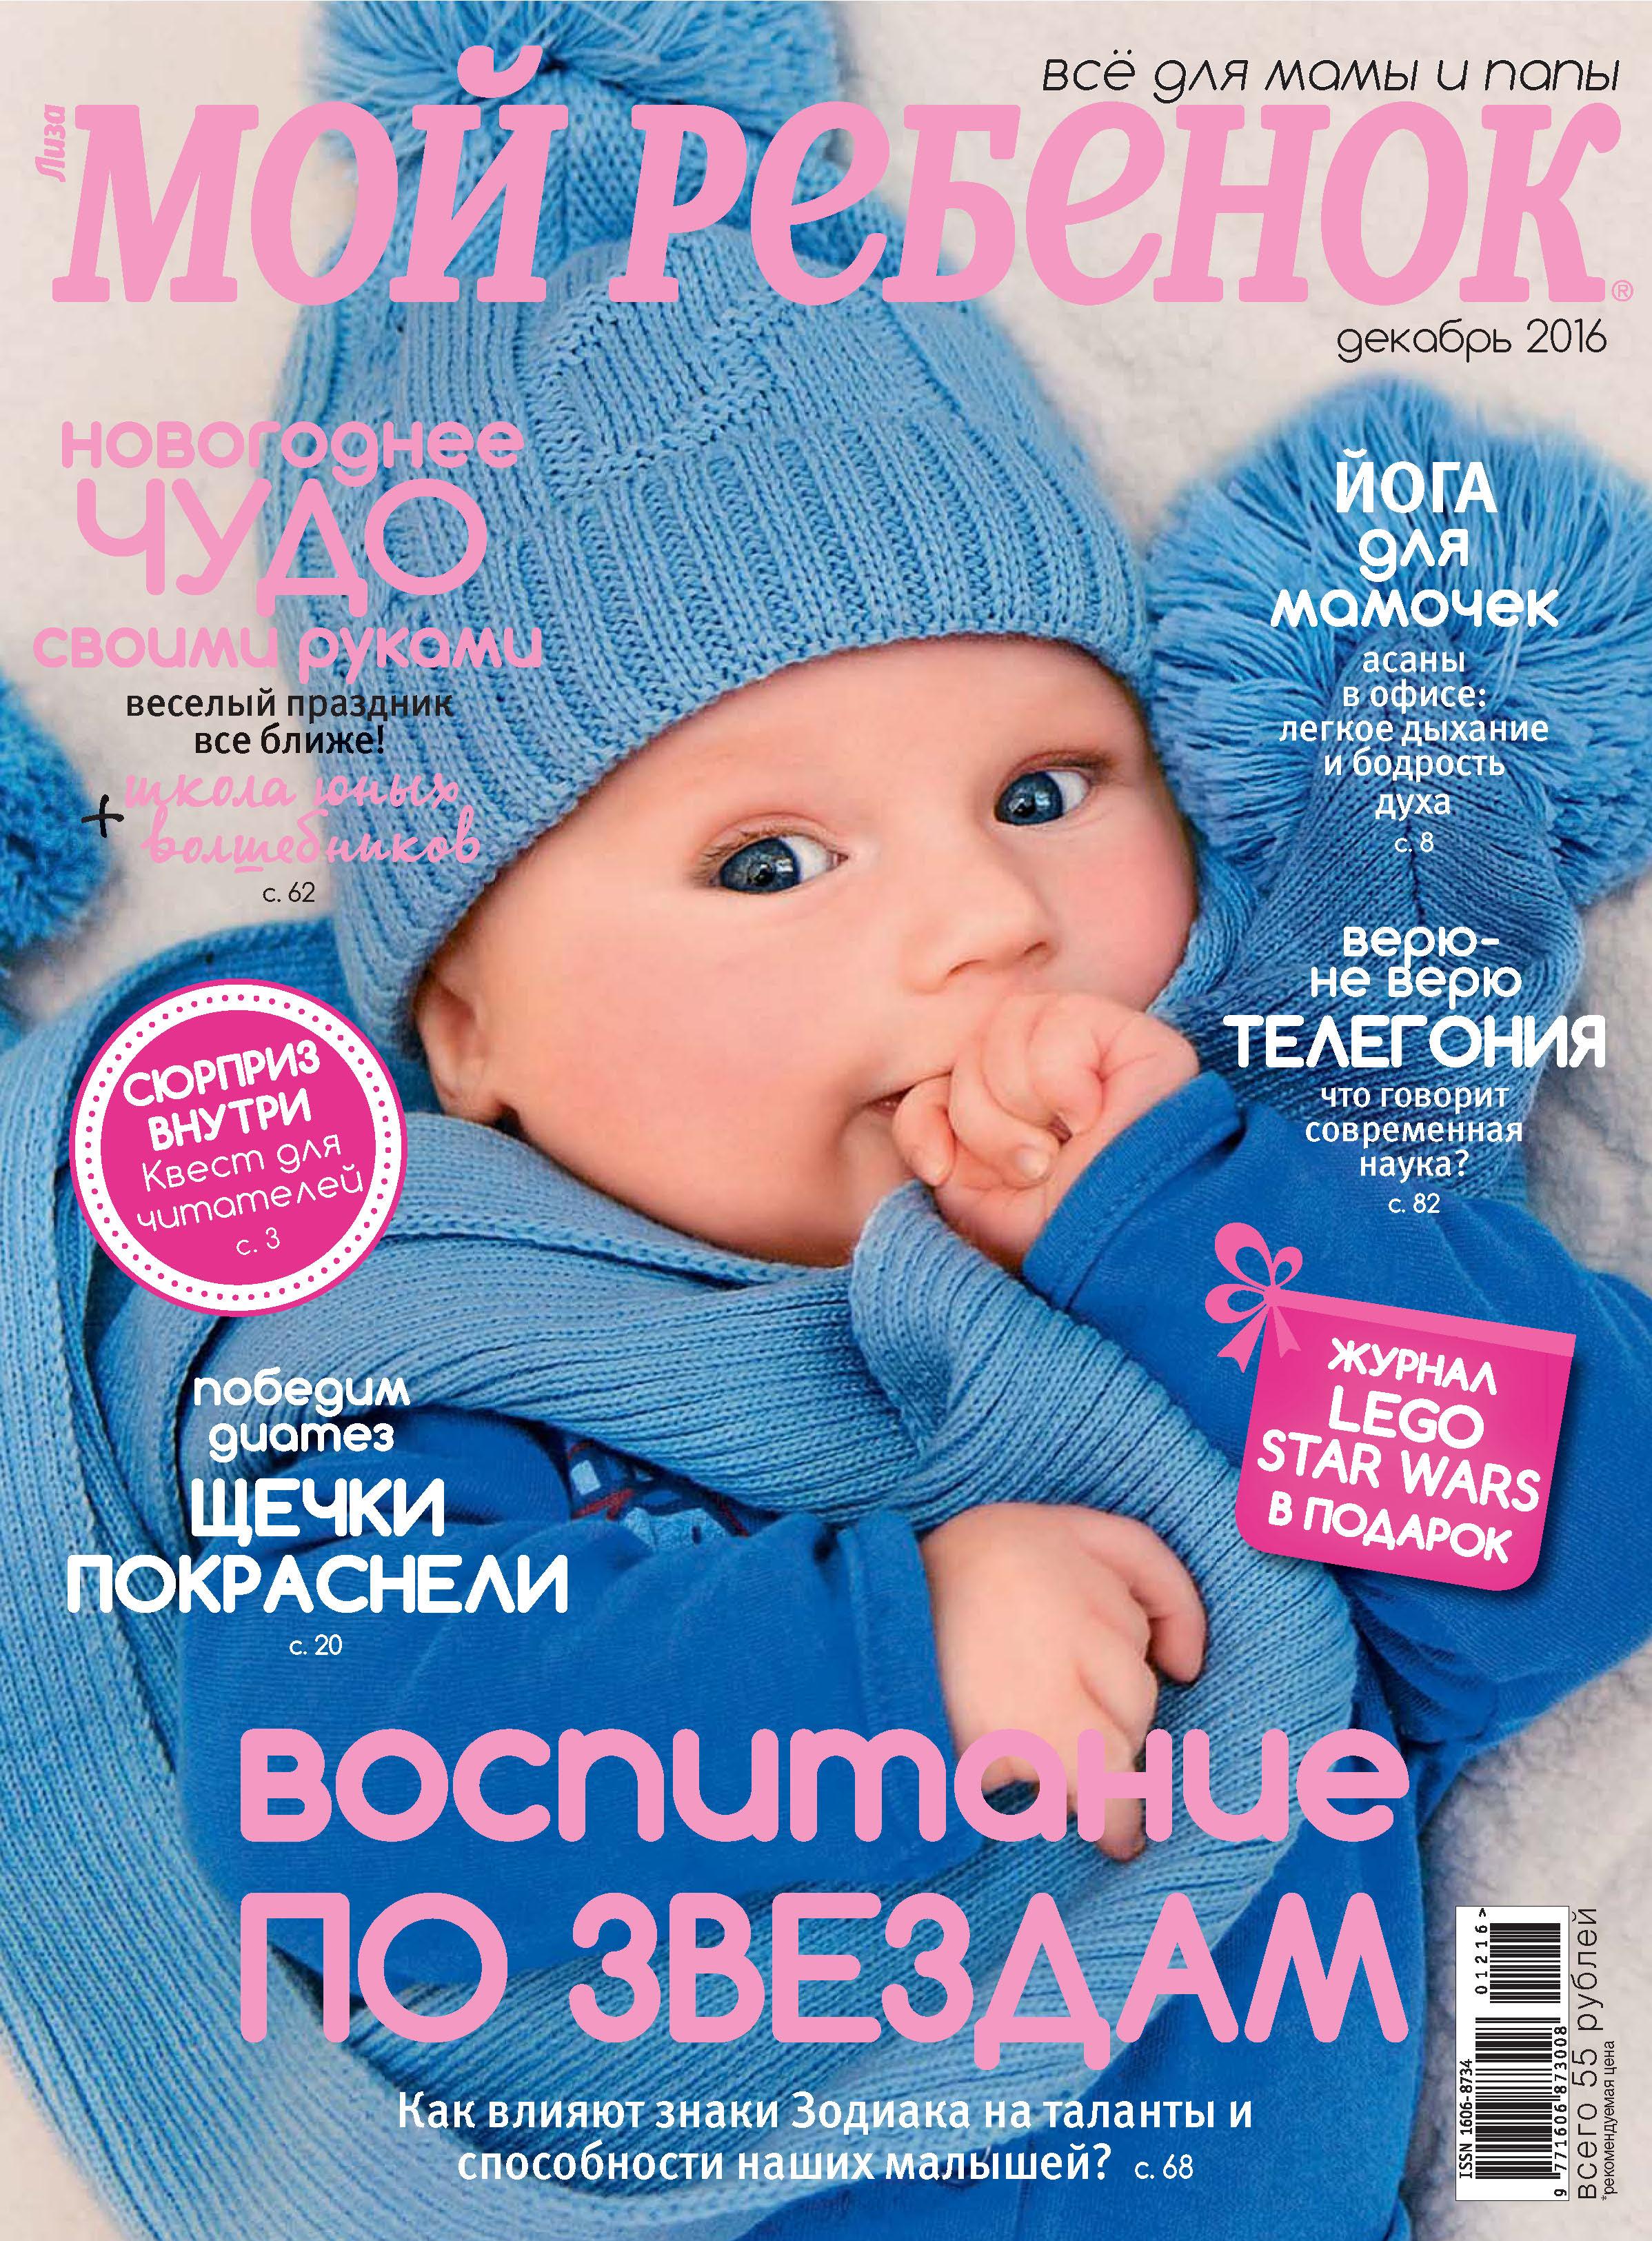 ИД «Бурда» Журнал «Лиза. Мой ребенок» №12/2016 ид бурда журнал лиза мой ребенок 09 2016